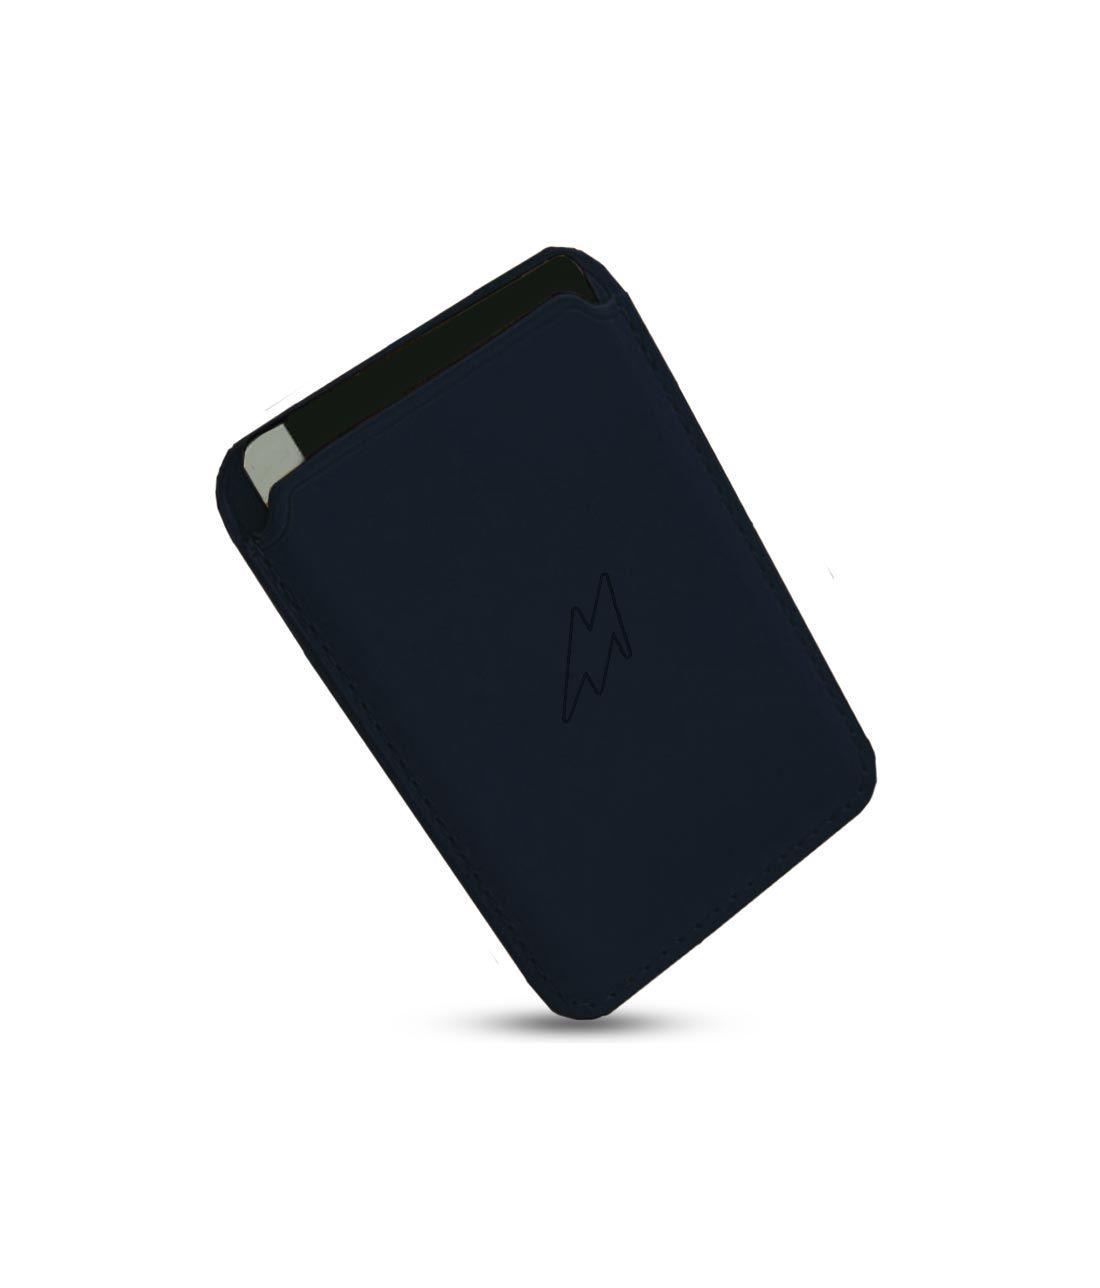 Leather Case Blue - Magsafe Card Case